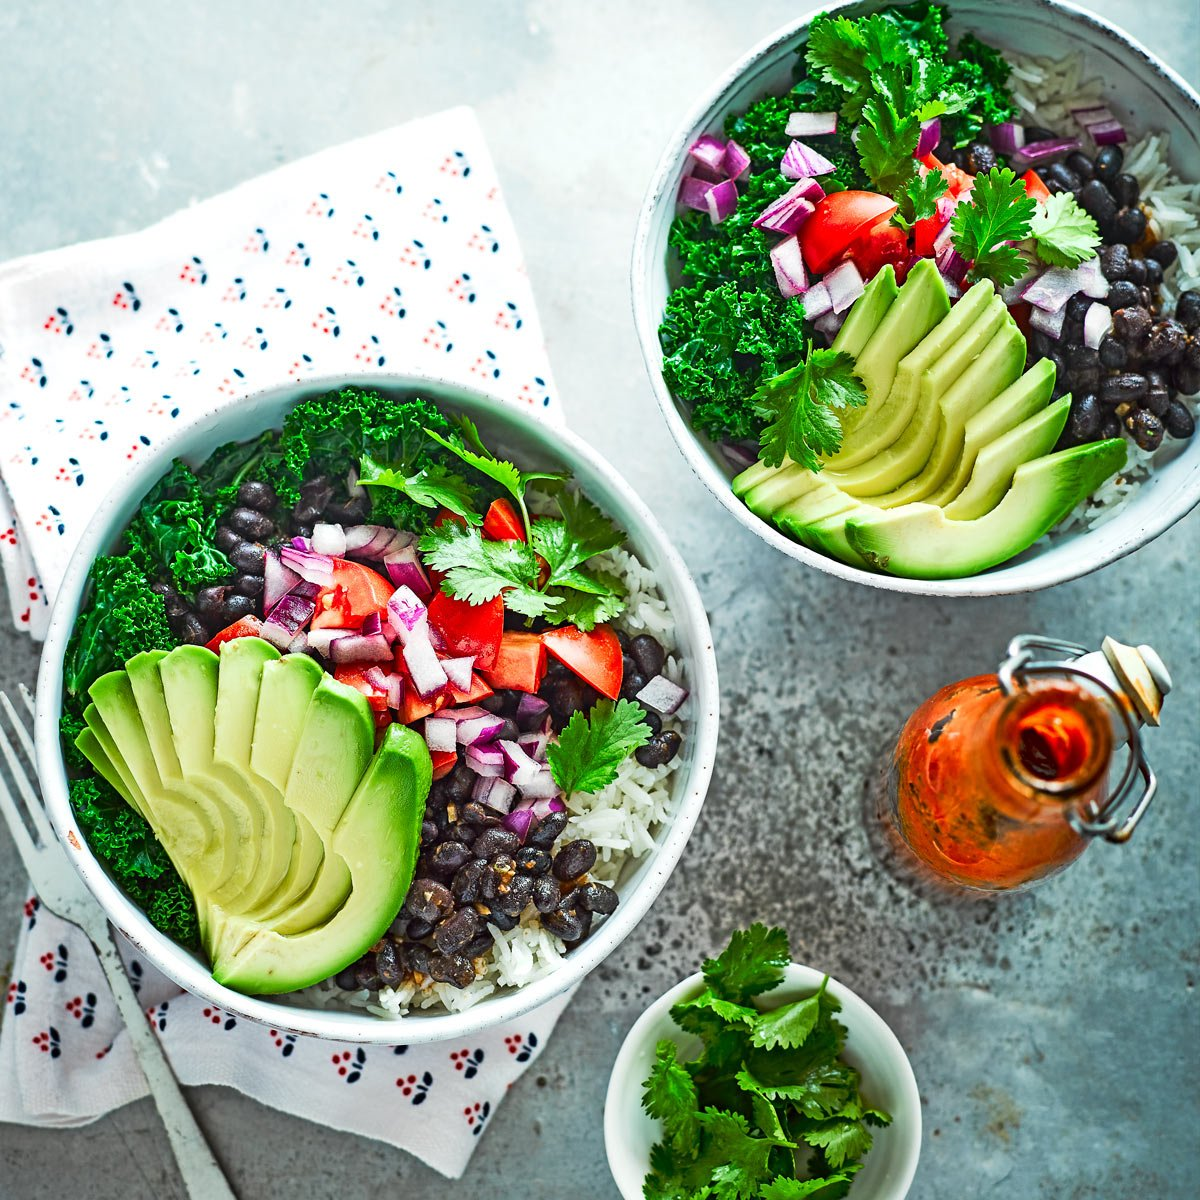 All we want for #MeatFreeMonday is a black bean burrito bowl... https://t.co/KXTLPAVcFI https://t.co/QvAp0S1ACS